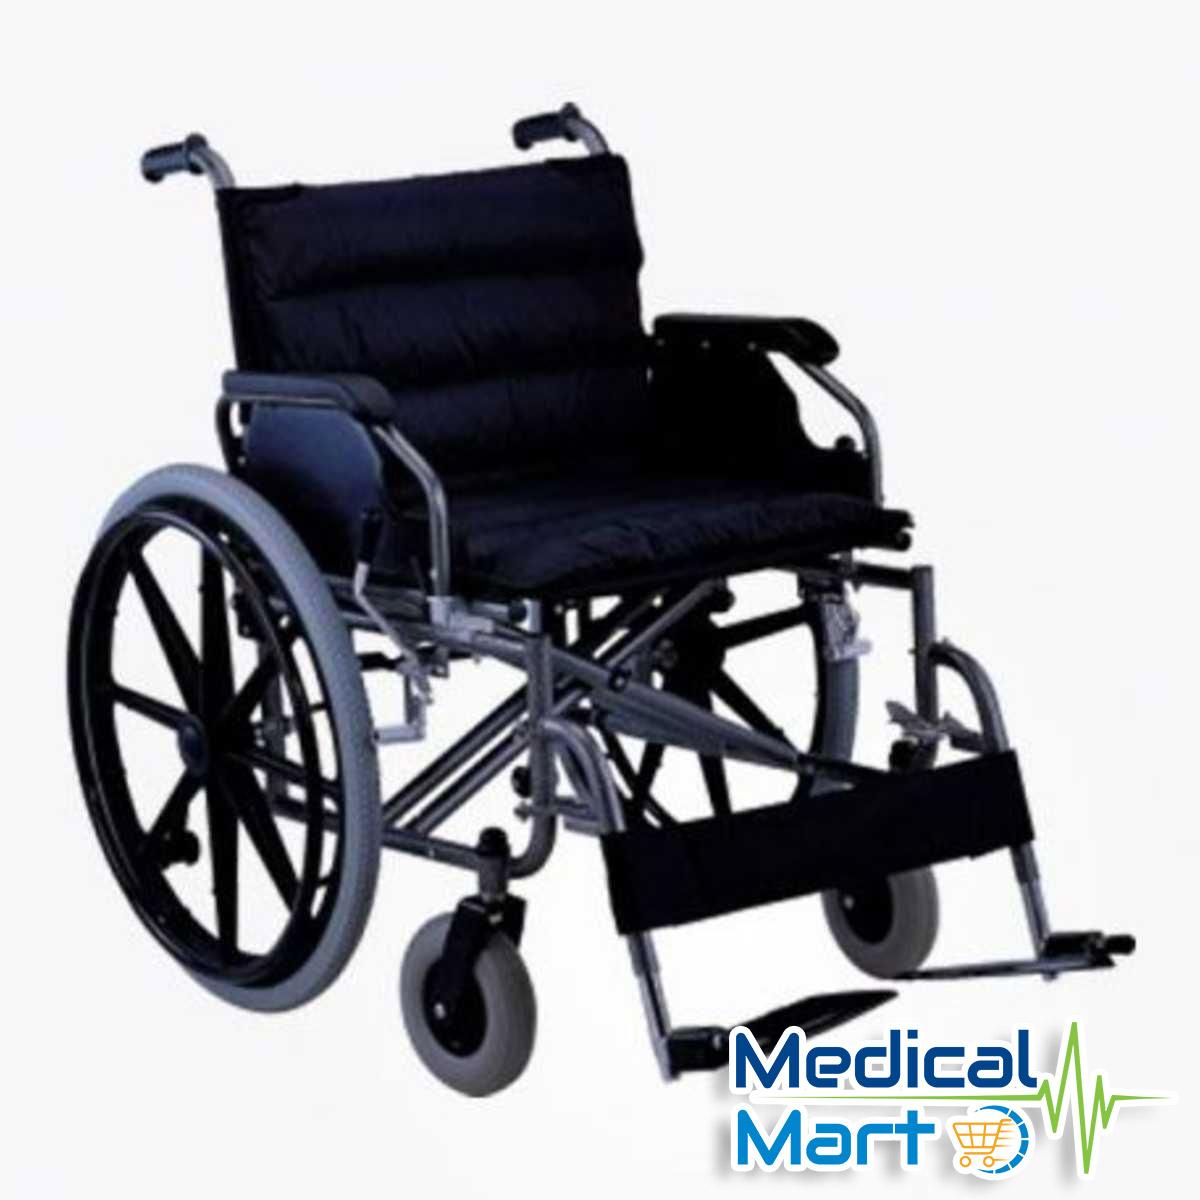 Stainless Wheelchair Model: 951b